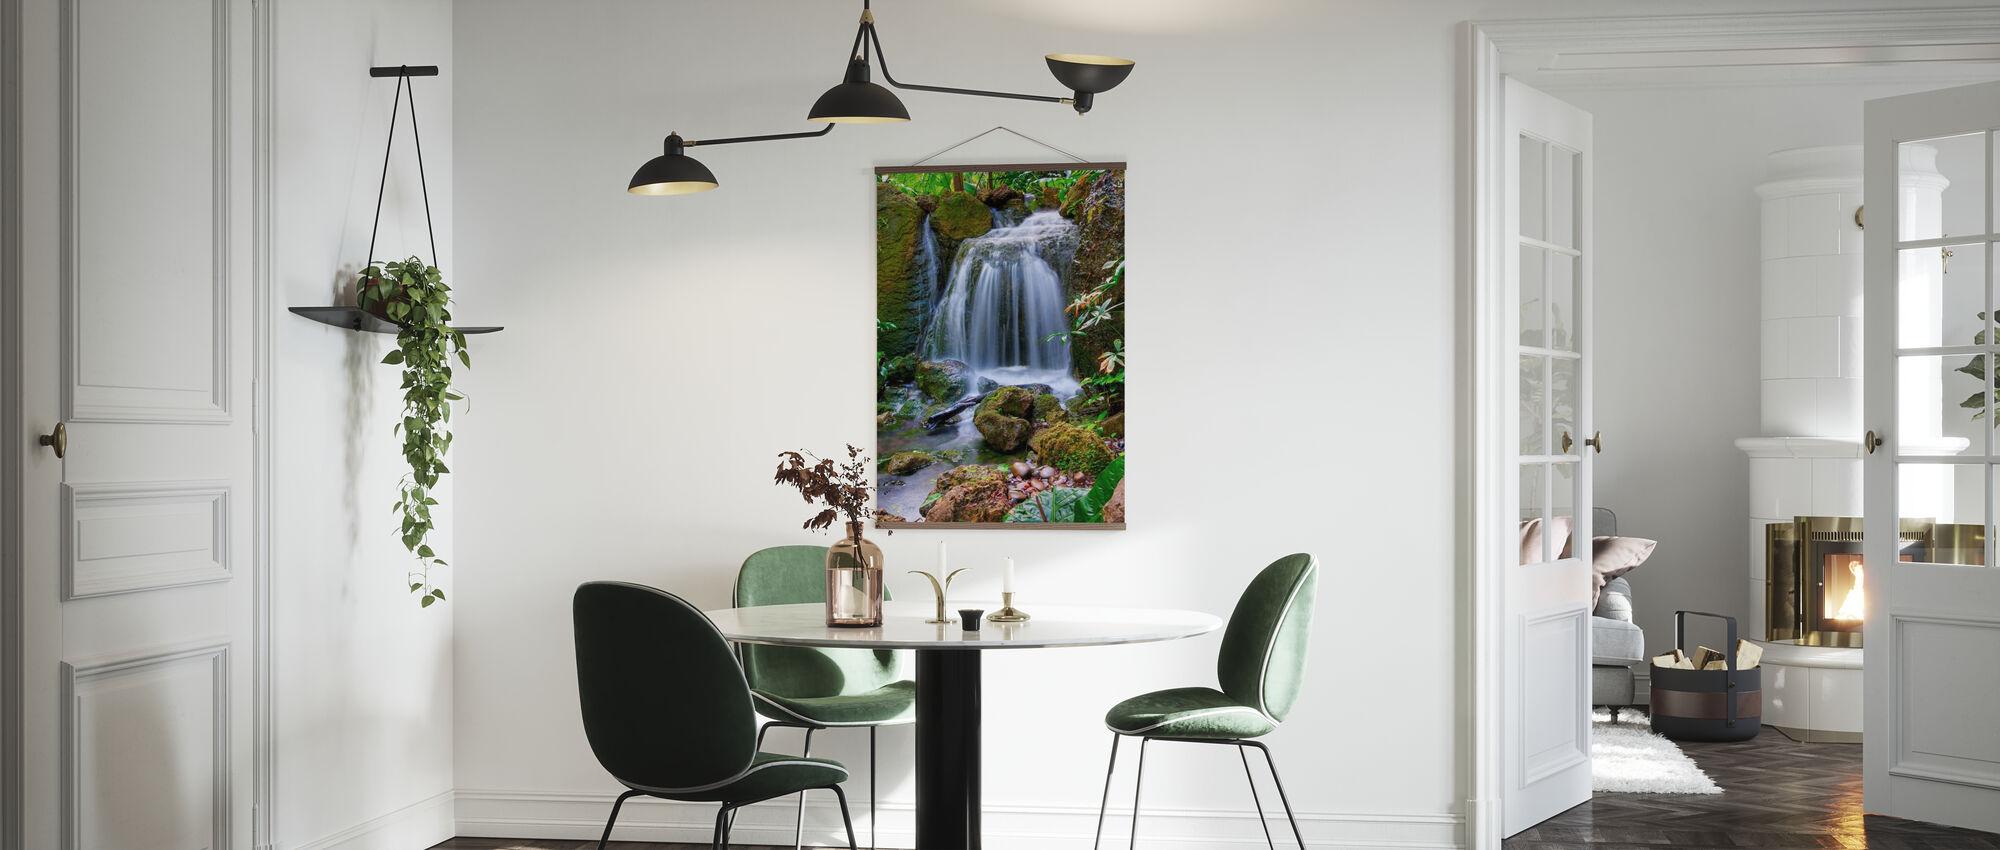 Natura Segreto - Poster - Cucina